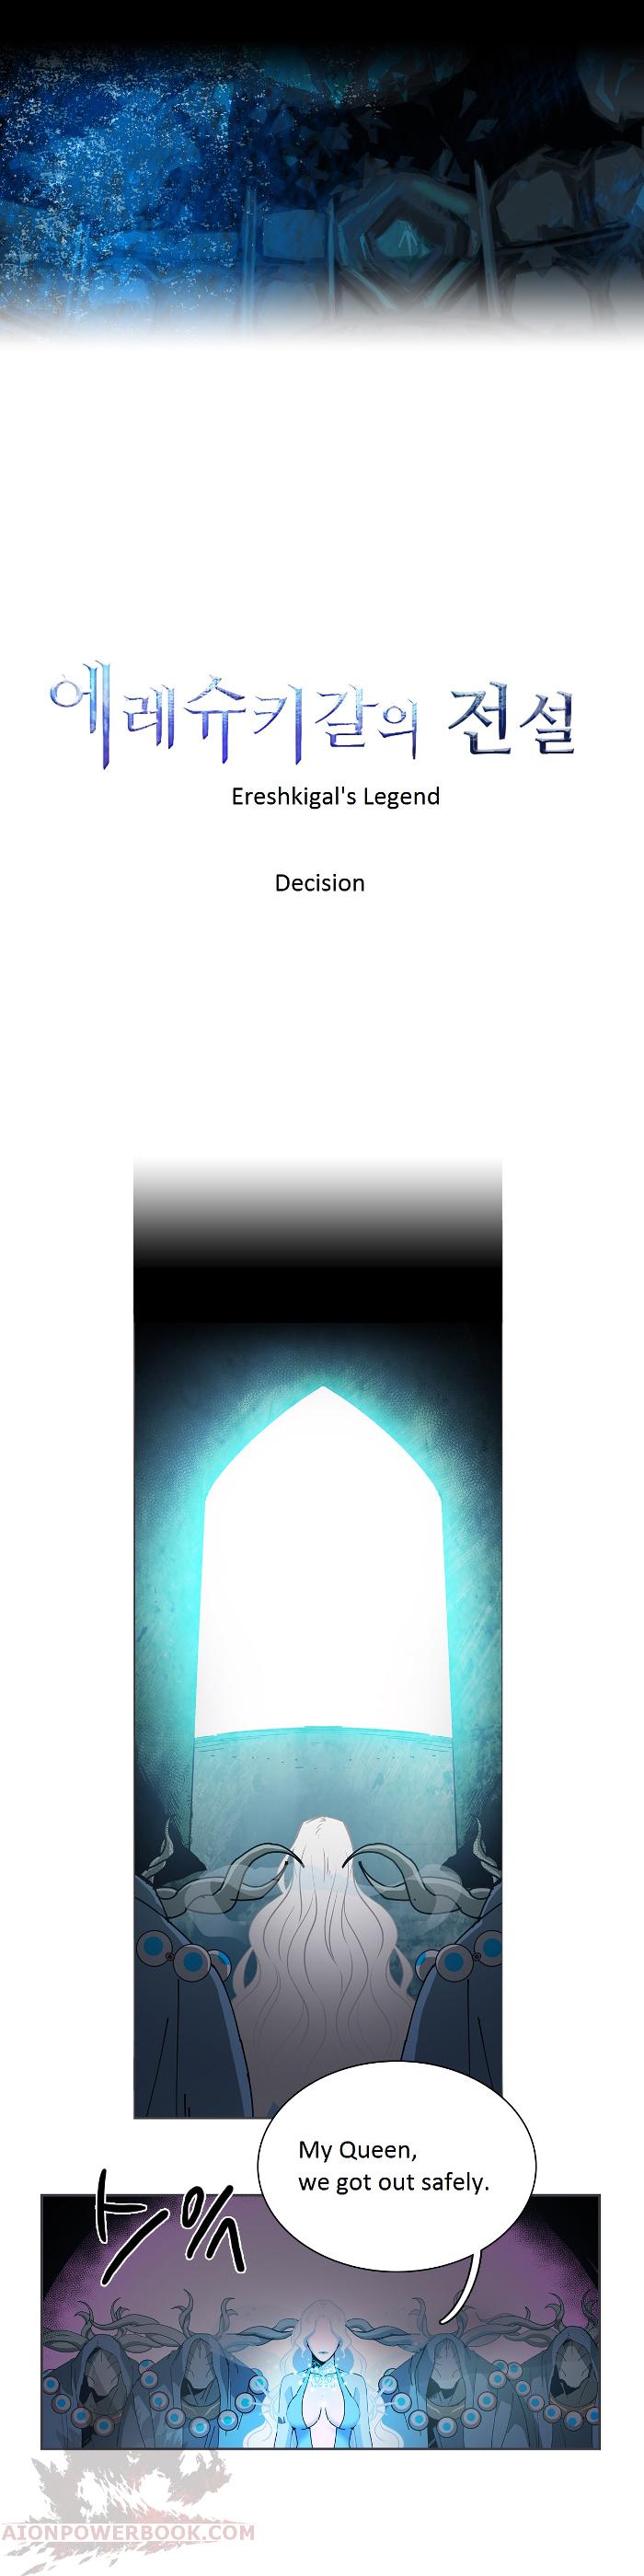 Ere4_0008.jpg